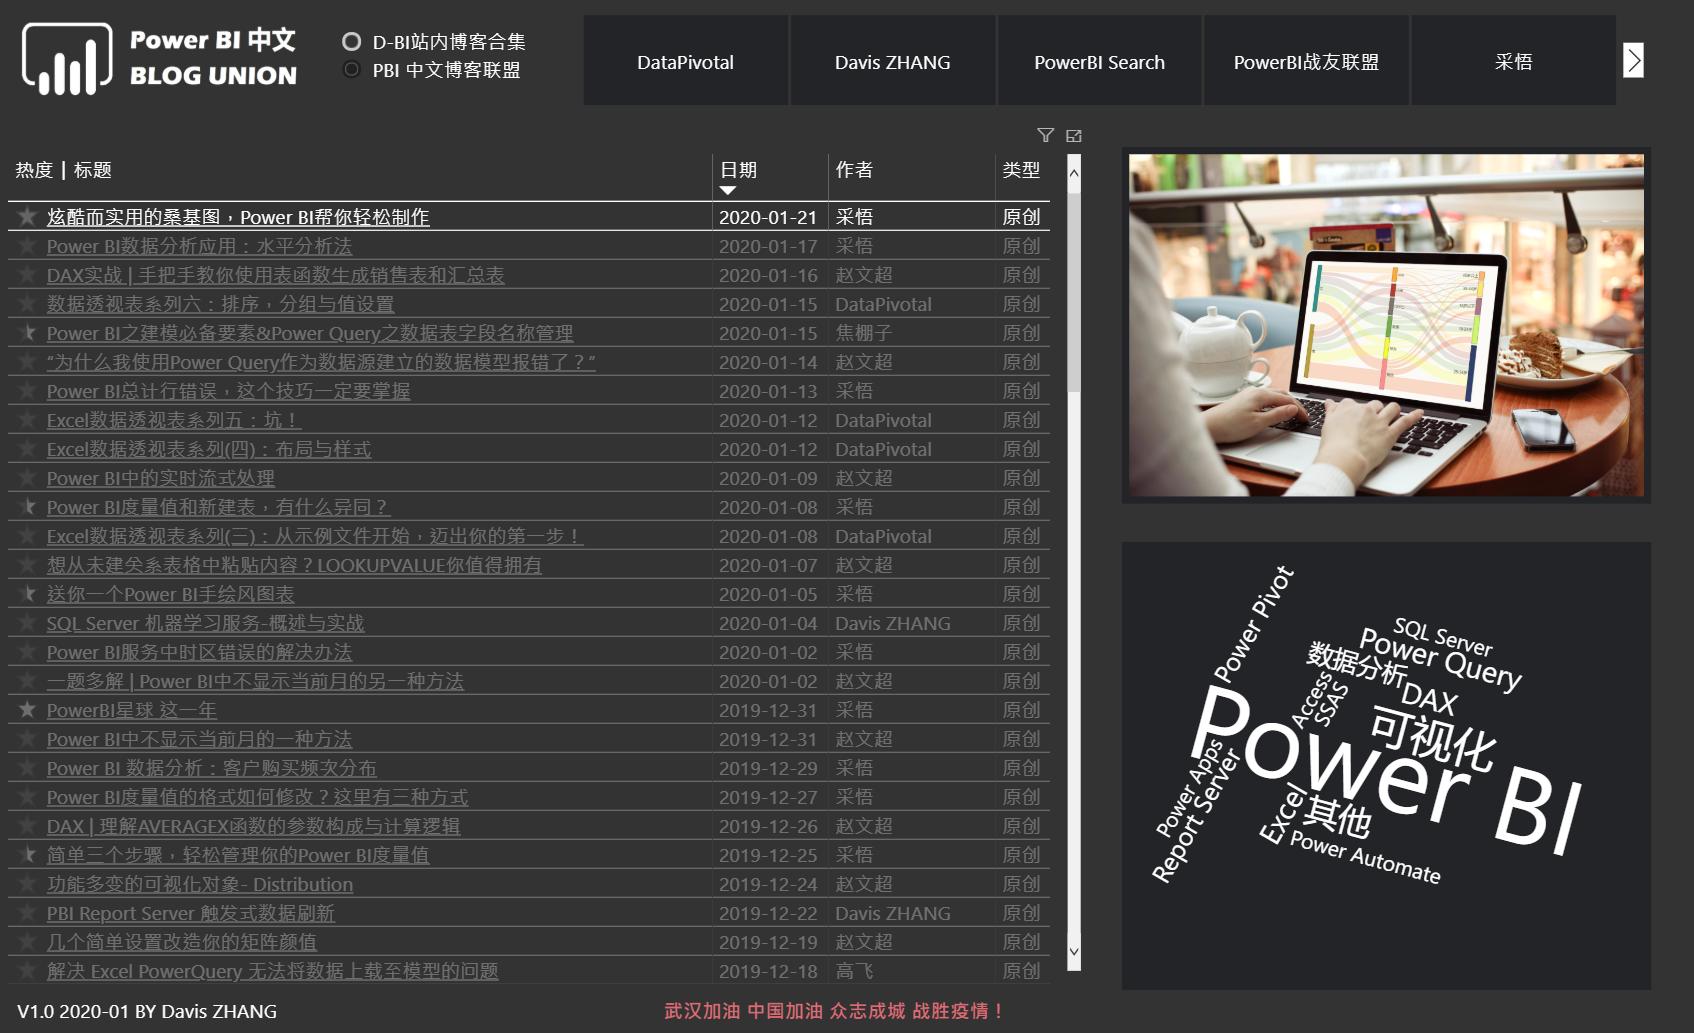 Power BI 中文博客联盟